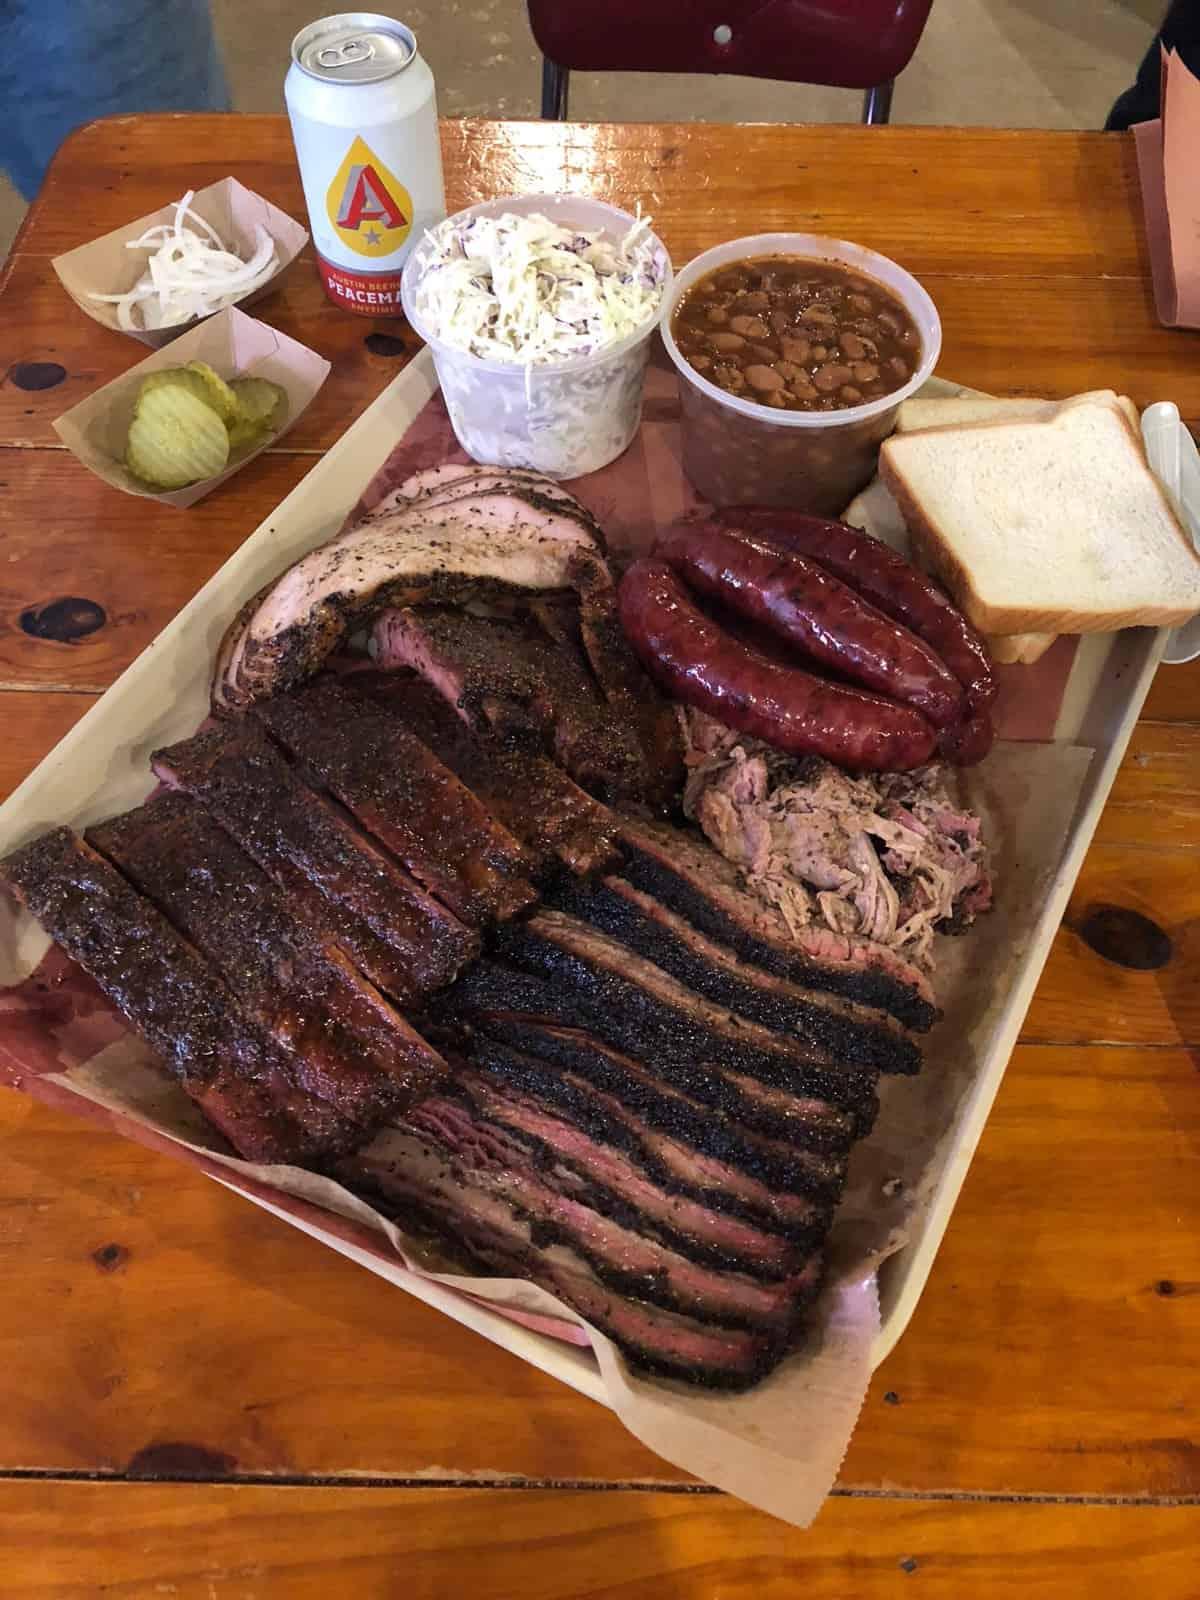 Huge pile of BBQ on a baking sheet - brisket, pulled pork, sausage, beans, coleslaw, turkey, and ribs,